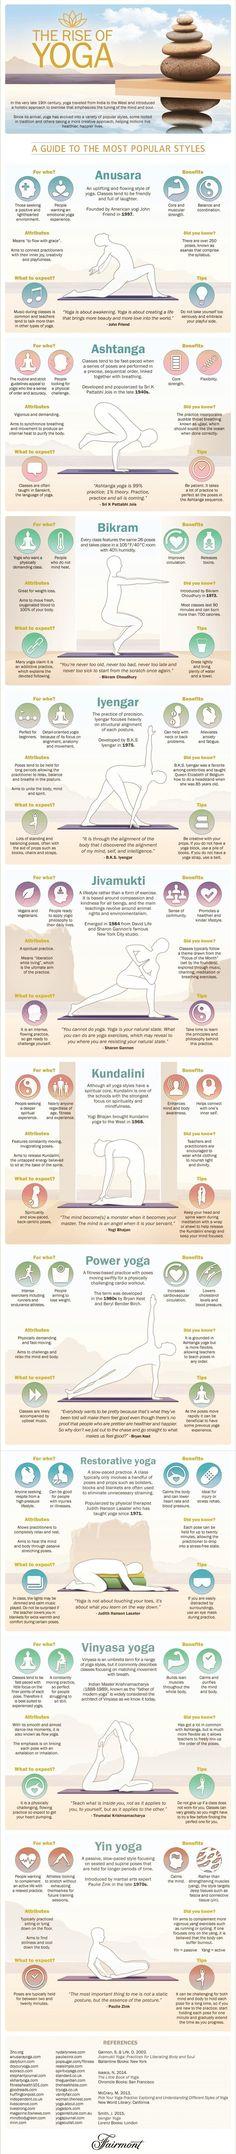 Most Popular Yoga Styles - Health Infographic. Topic: types of yoga, yogi, exercise, poses, postures, Anusara, Ashtanga, Bikram, Kripalu, Hatha, Iyengar, Kundalini, Jivamukti, Prenatal, Restorative, Sivananda, Viniyoga, Yin, Power yoga. https://www.pinter http://www.yogaweightloss.net/category/types-of-yoga/